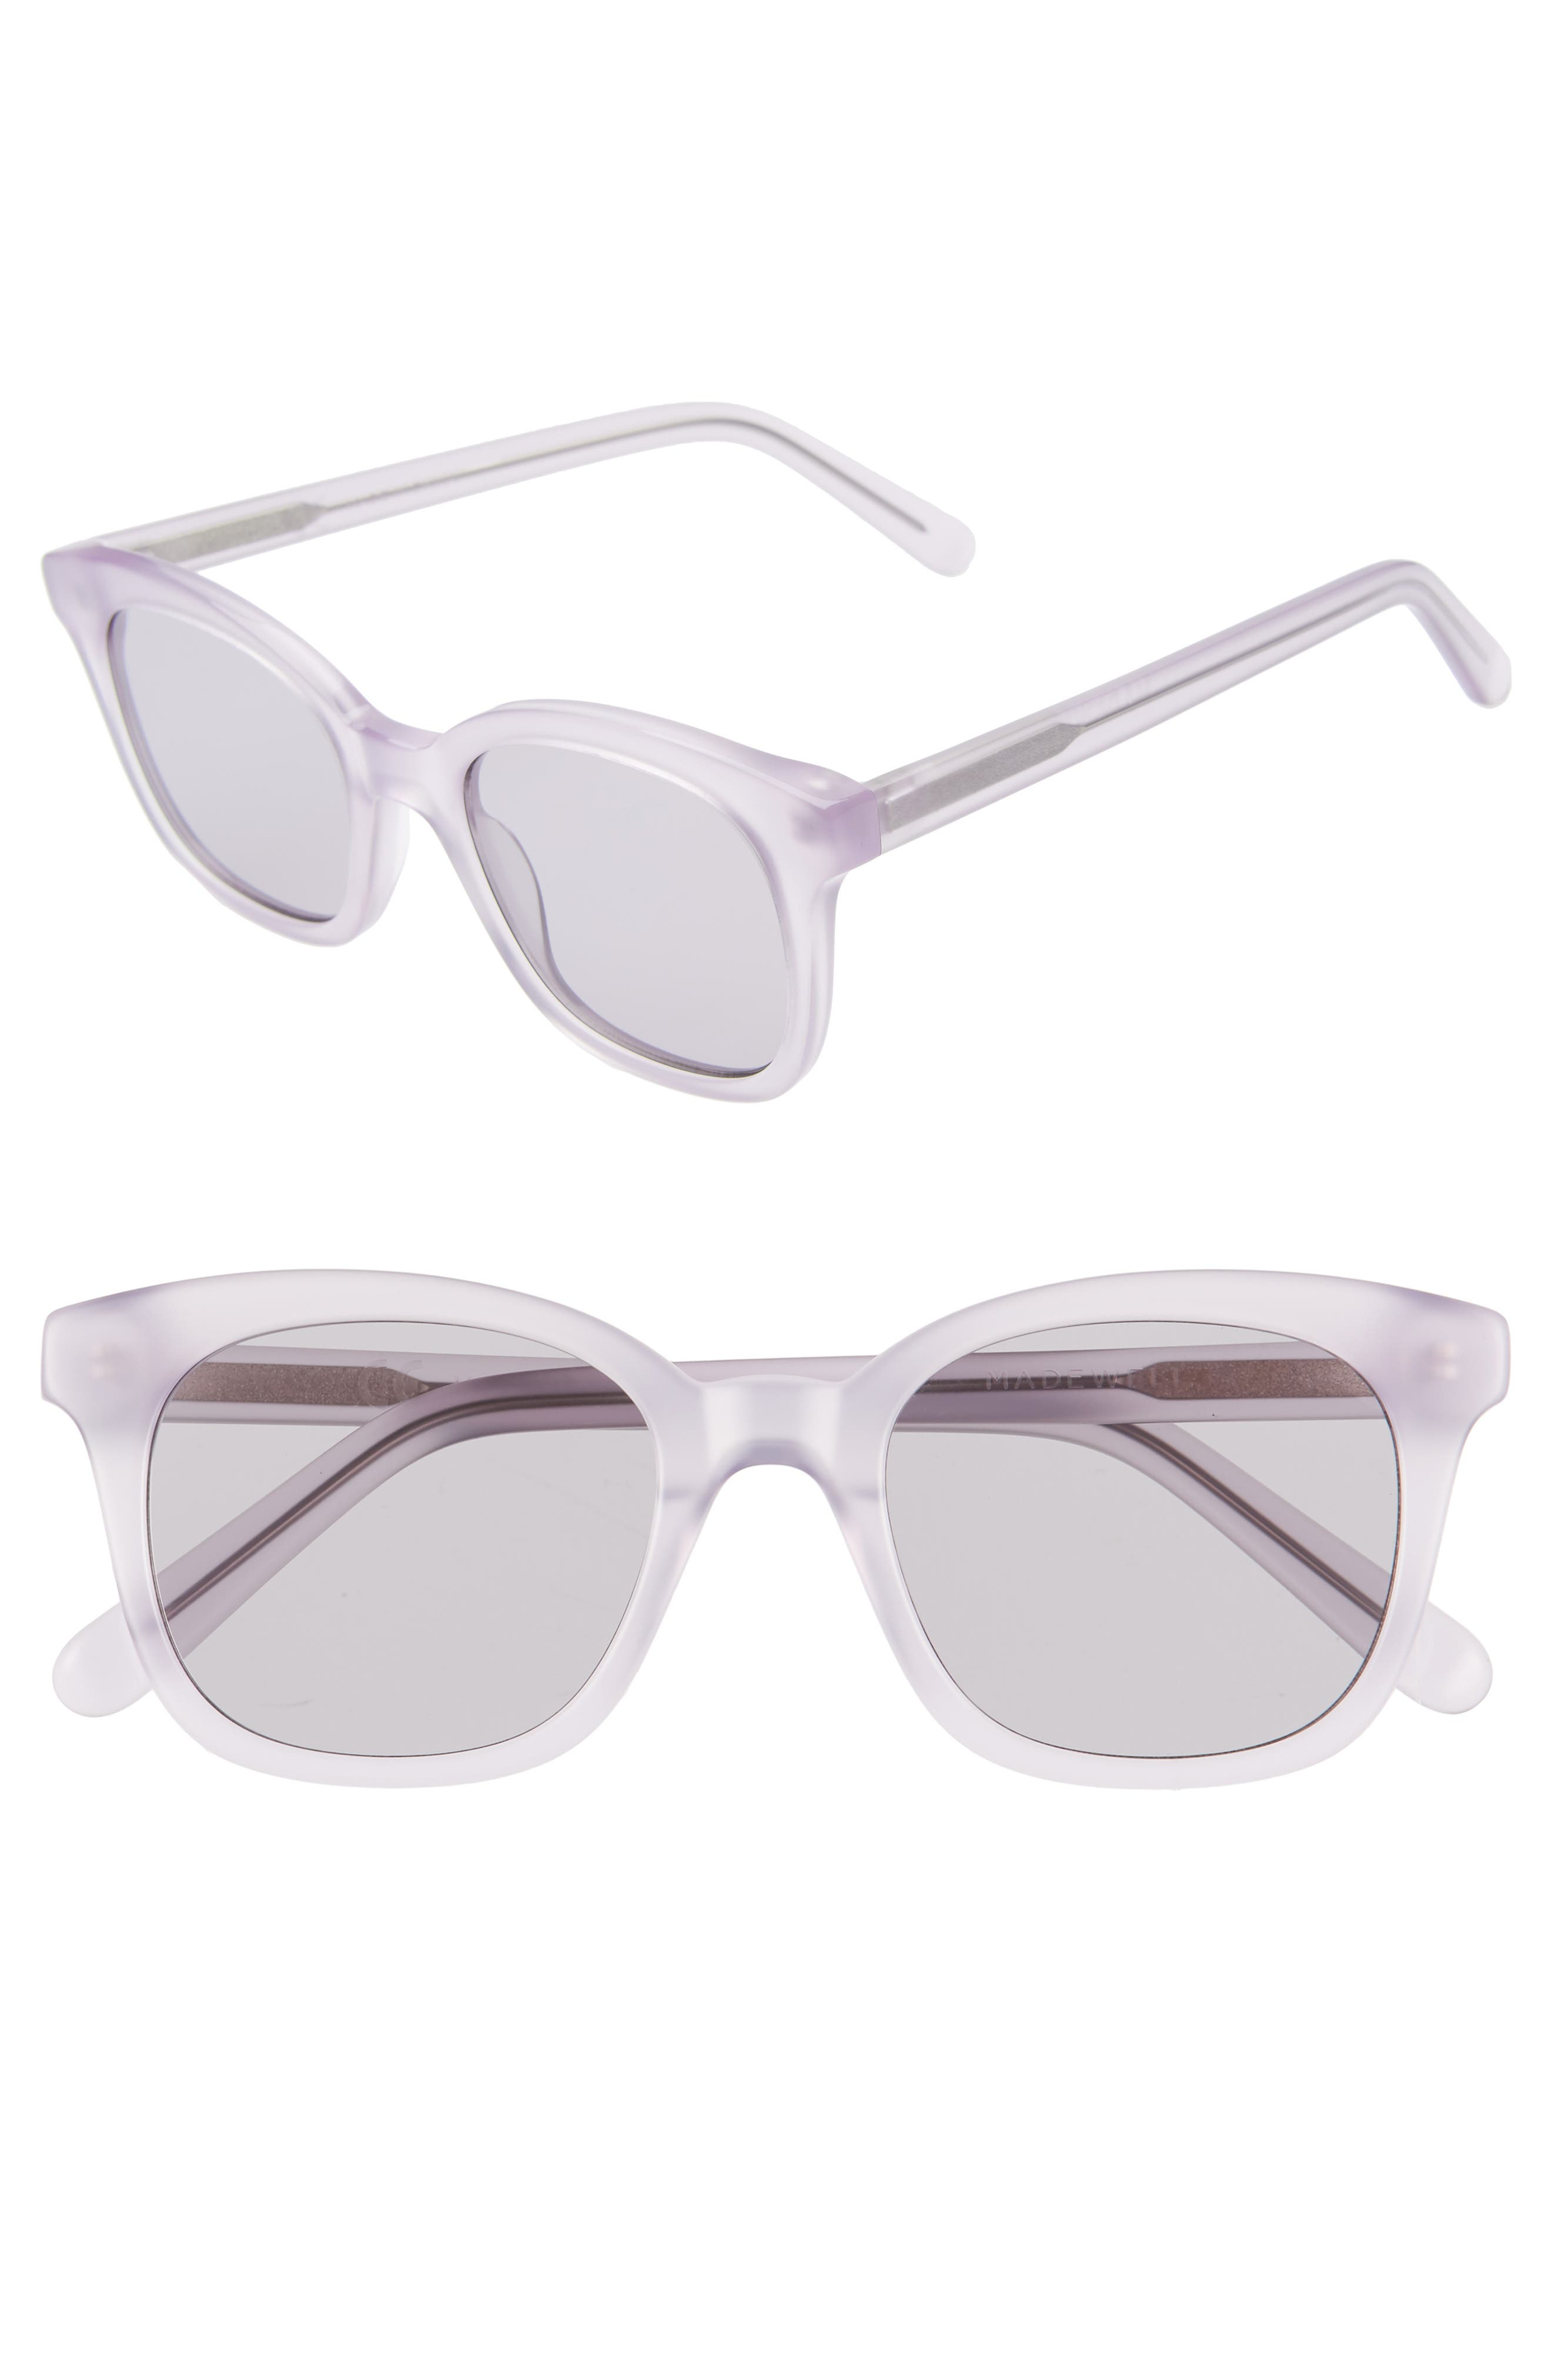 bff4fe6e594f3 Madewell Sunglasses for Women